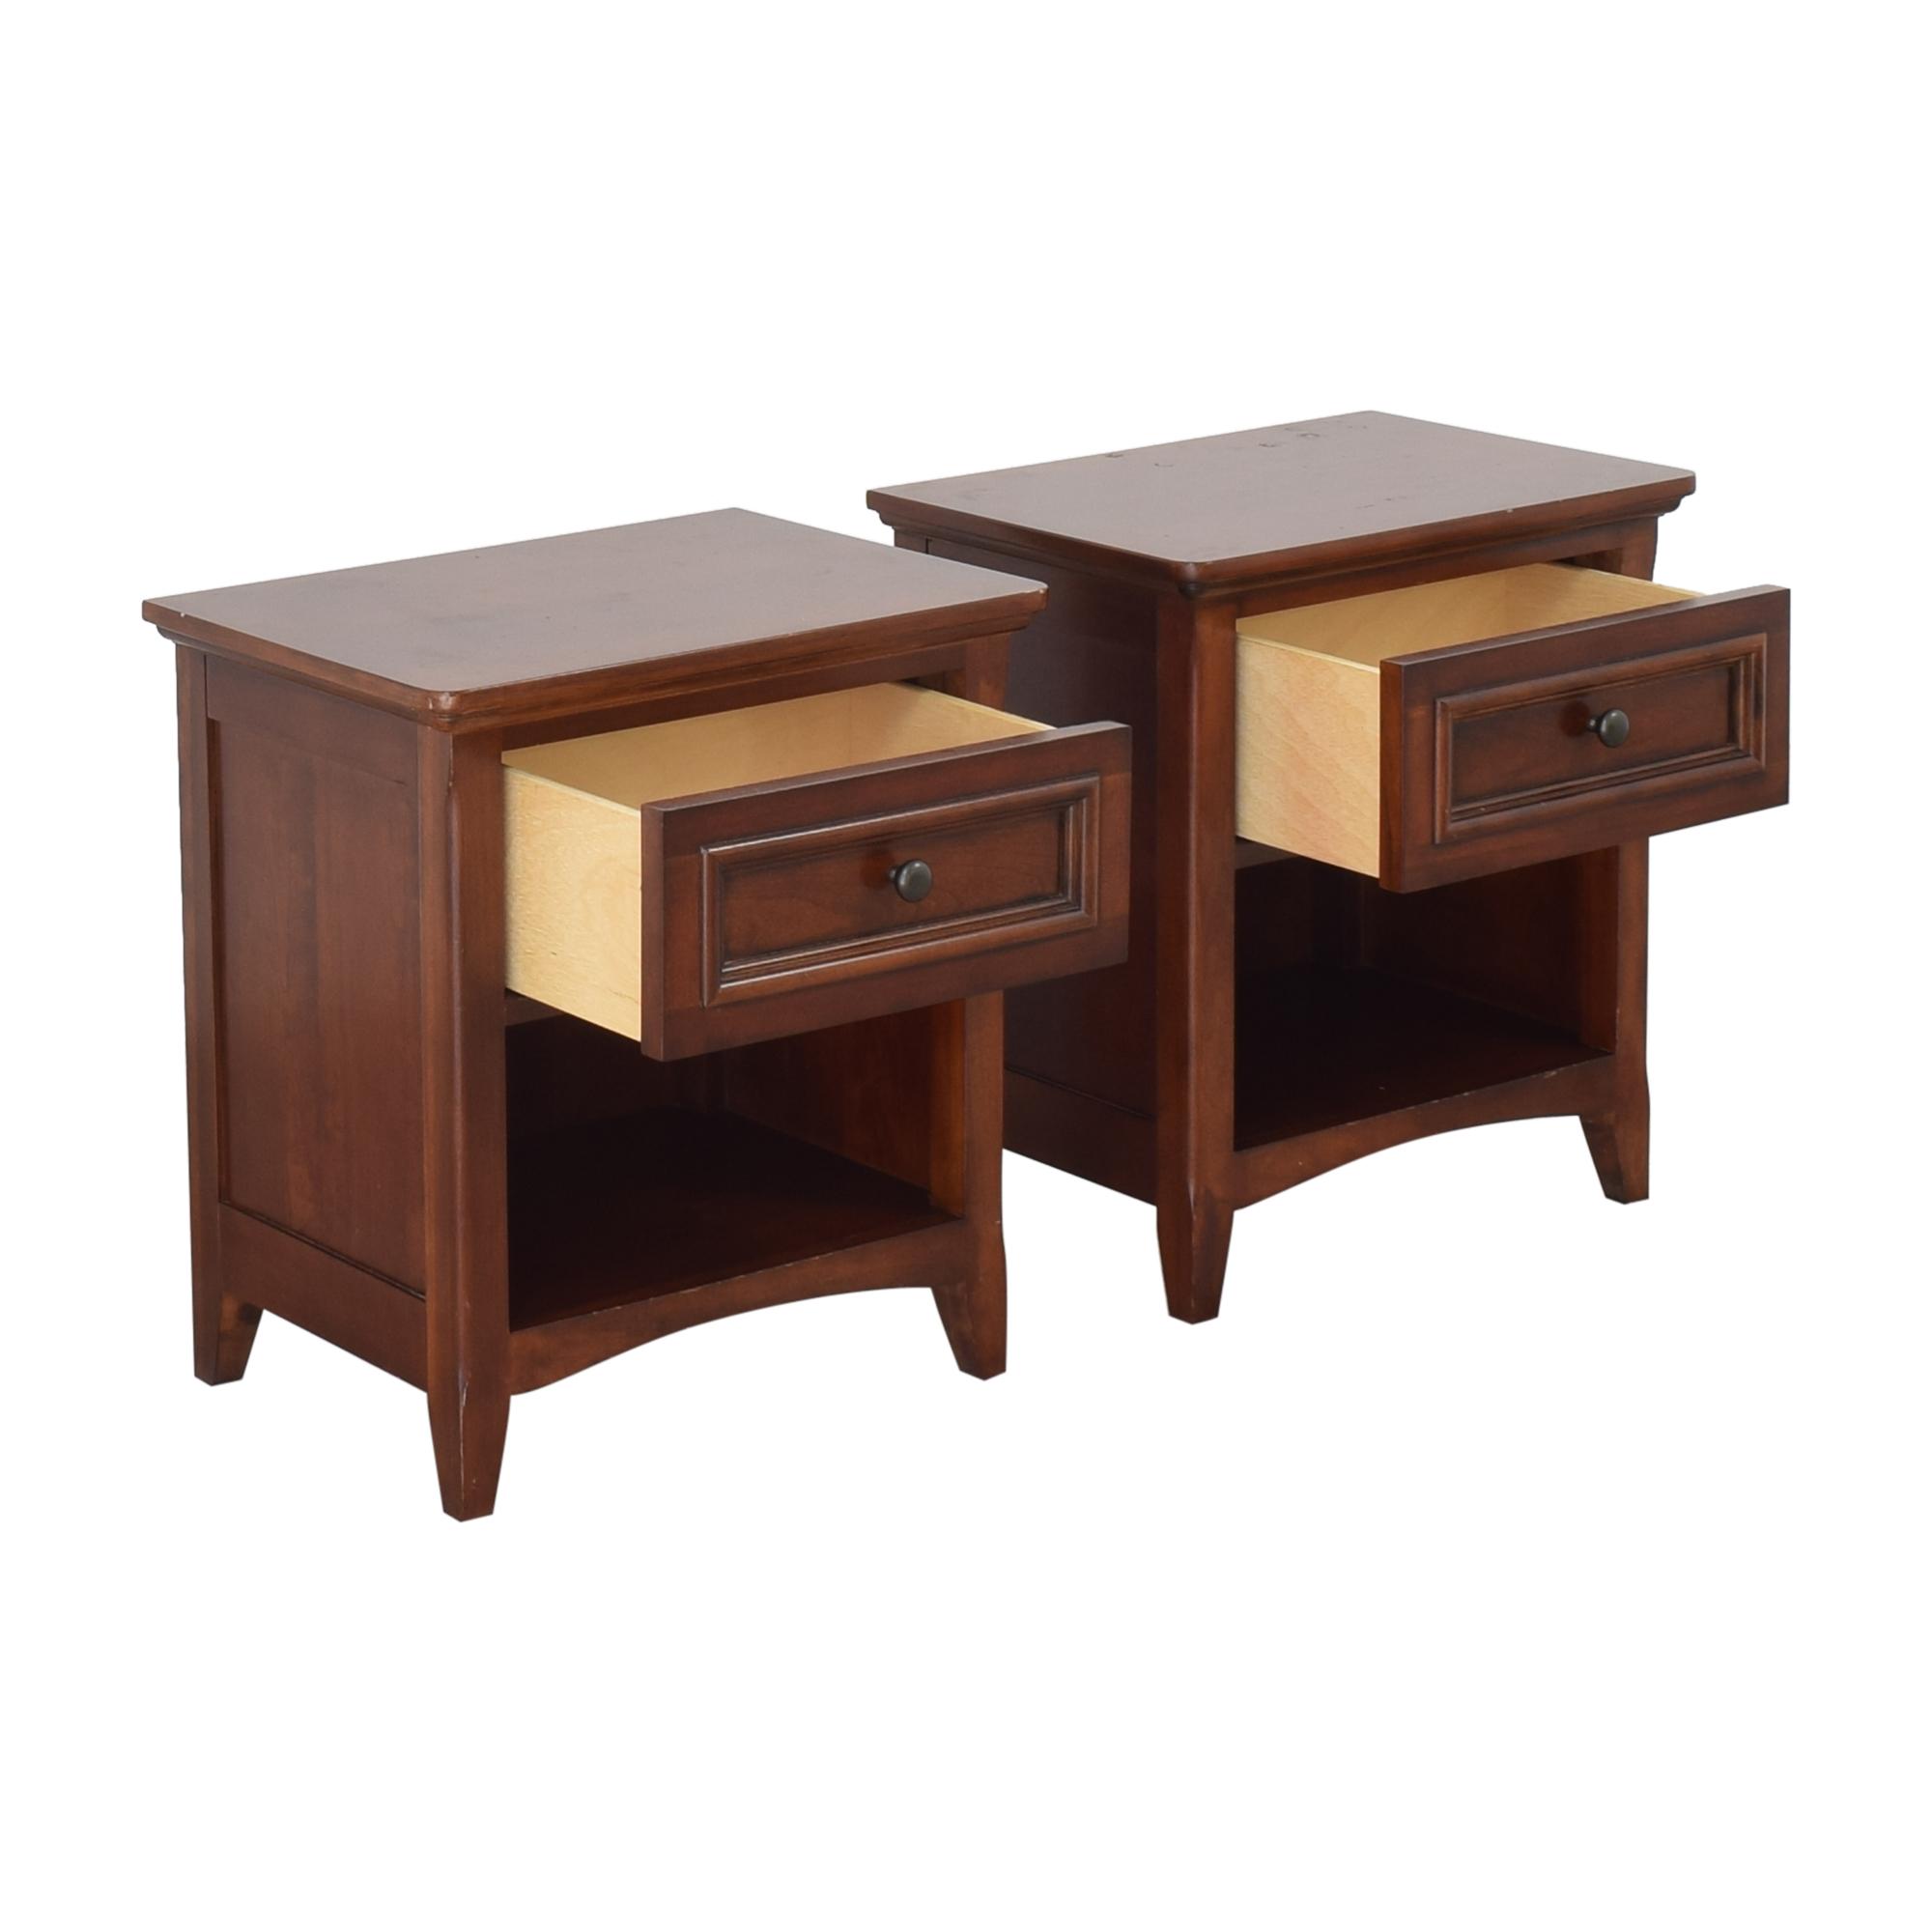 Broyhill Furniture Broyhill Furniture Night Stands